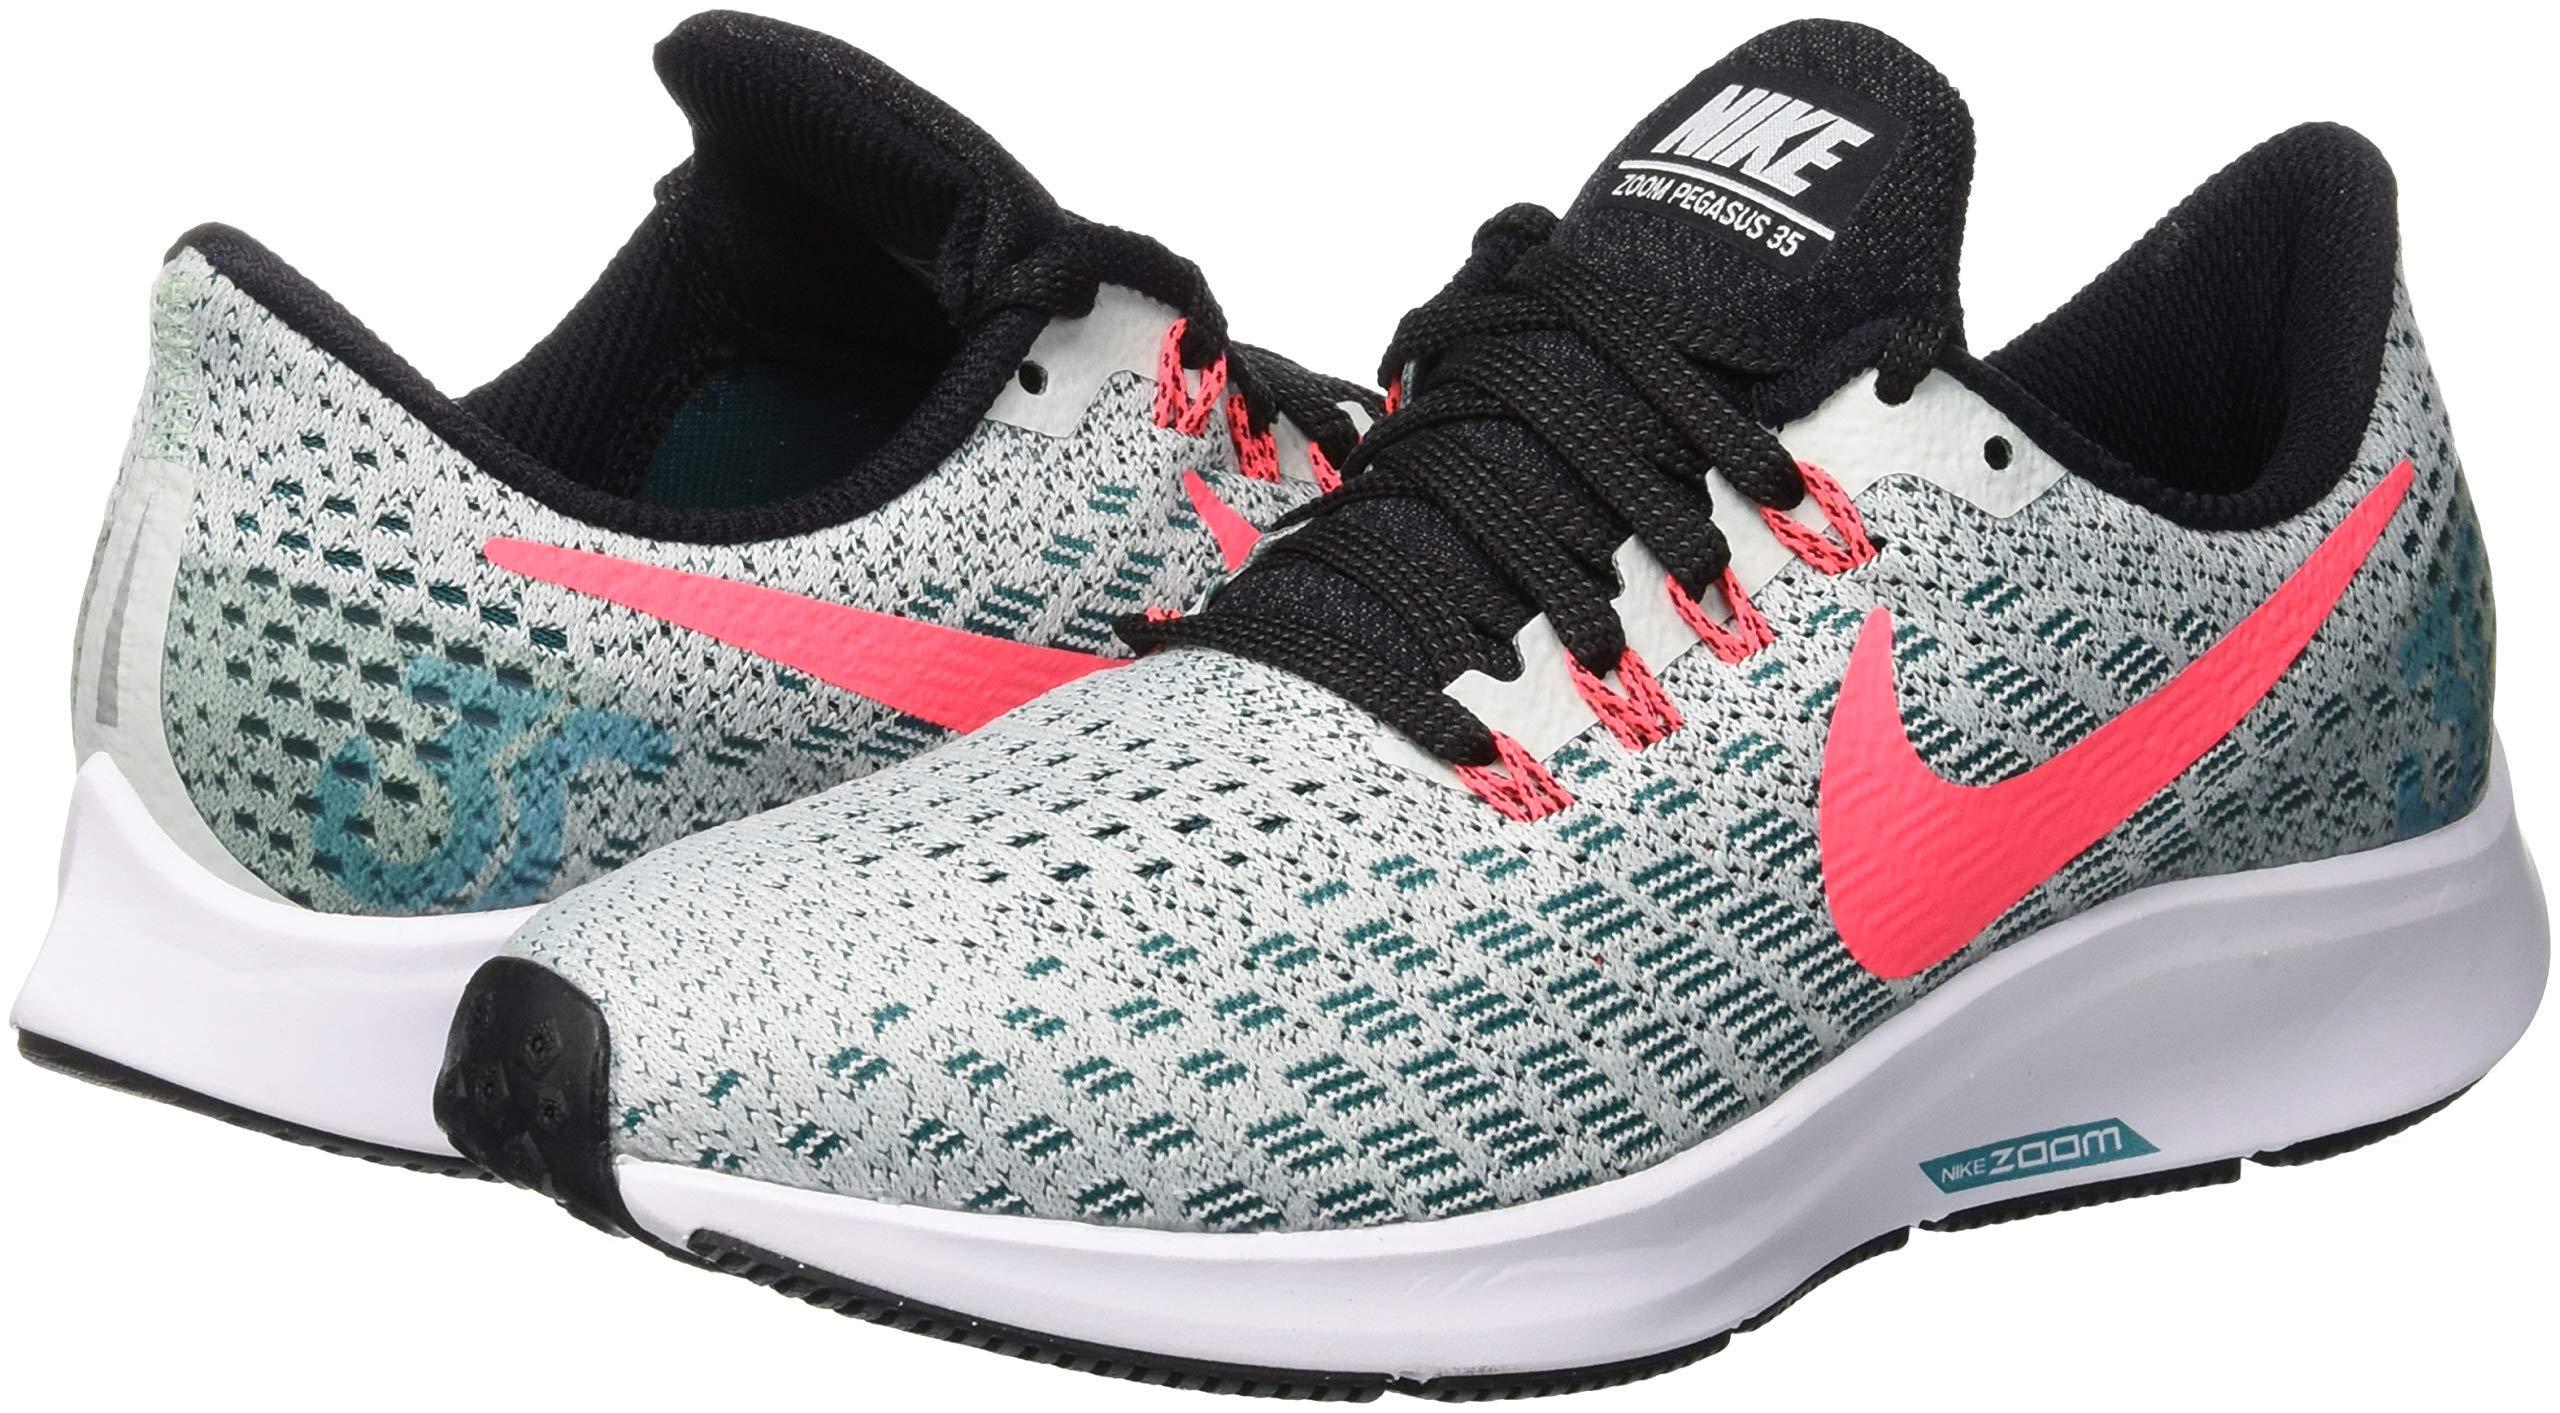 Nike Air Zoom Pegasus 35, Women's Running, Multicolored (Barely Grey/Hot Punch/Geode Teal/Black 009), 4 UK (EU) by Nike (Image #8)